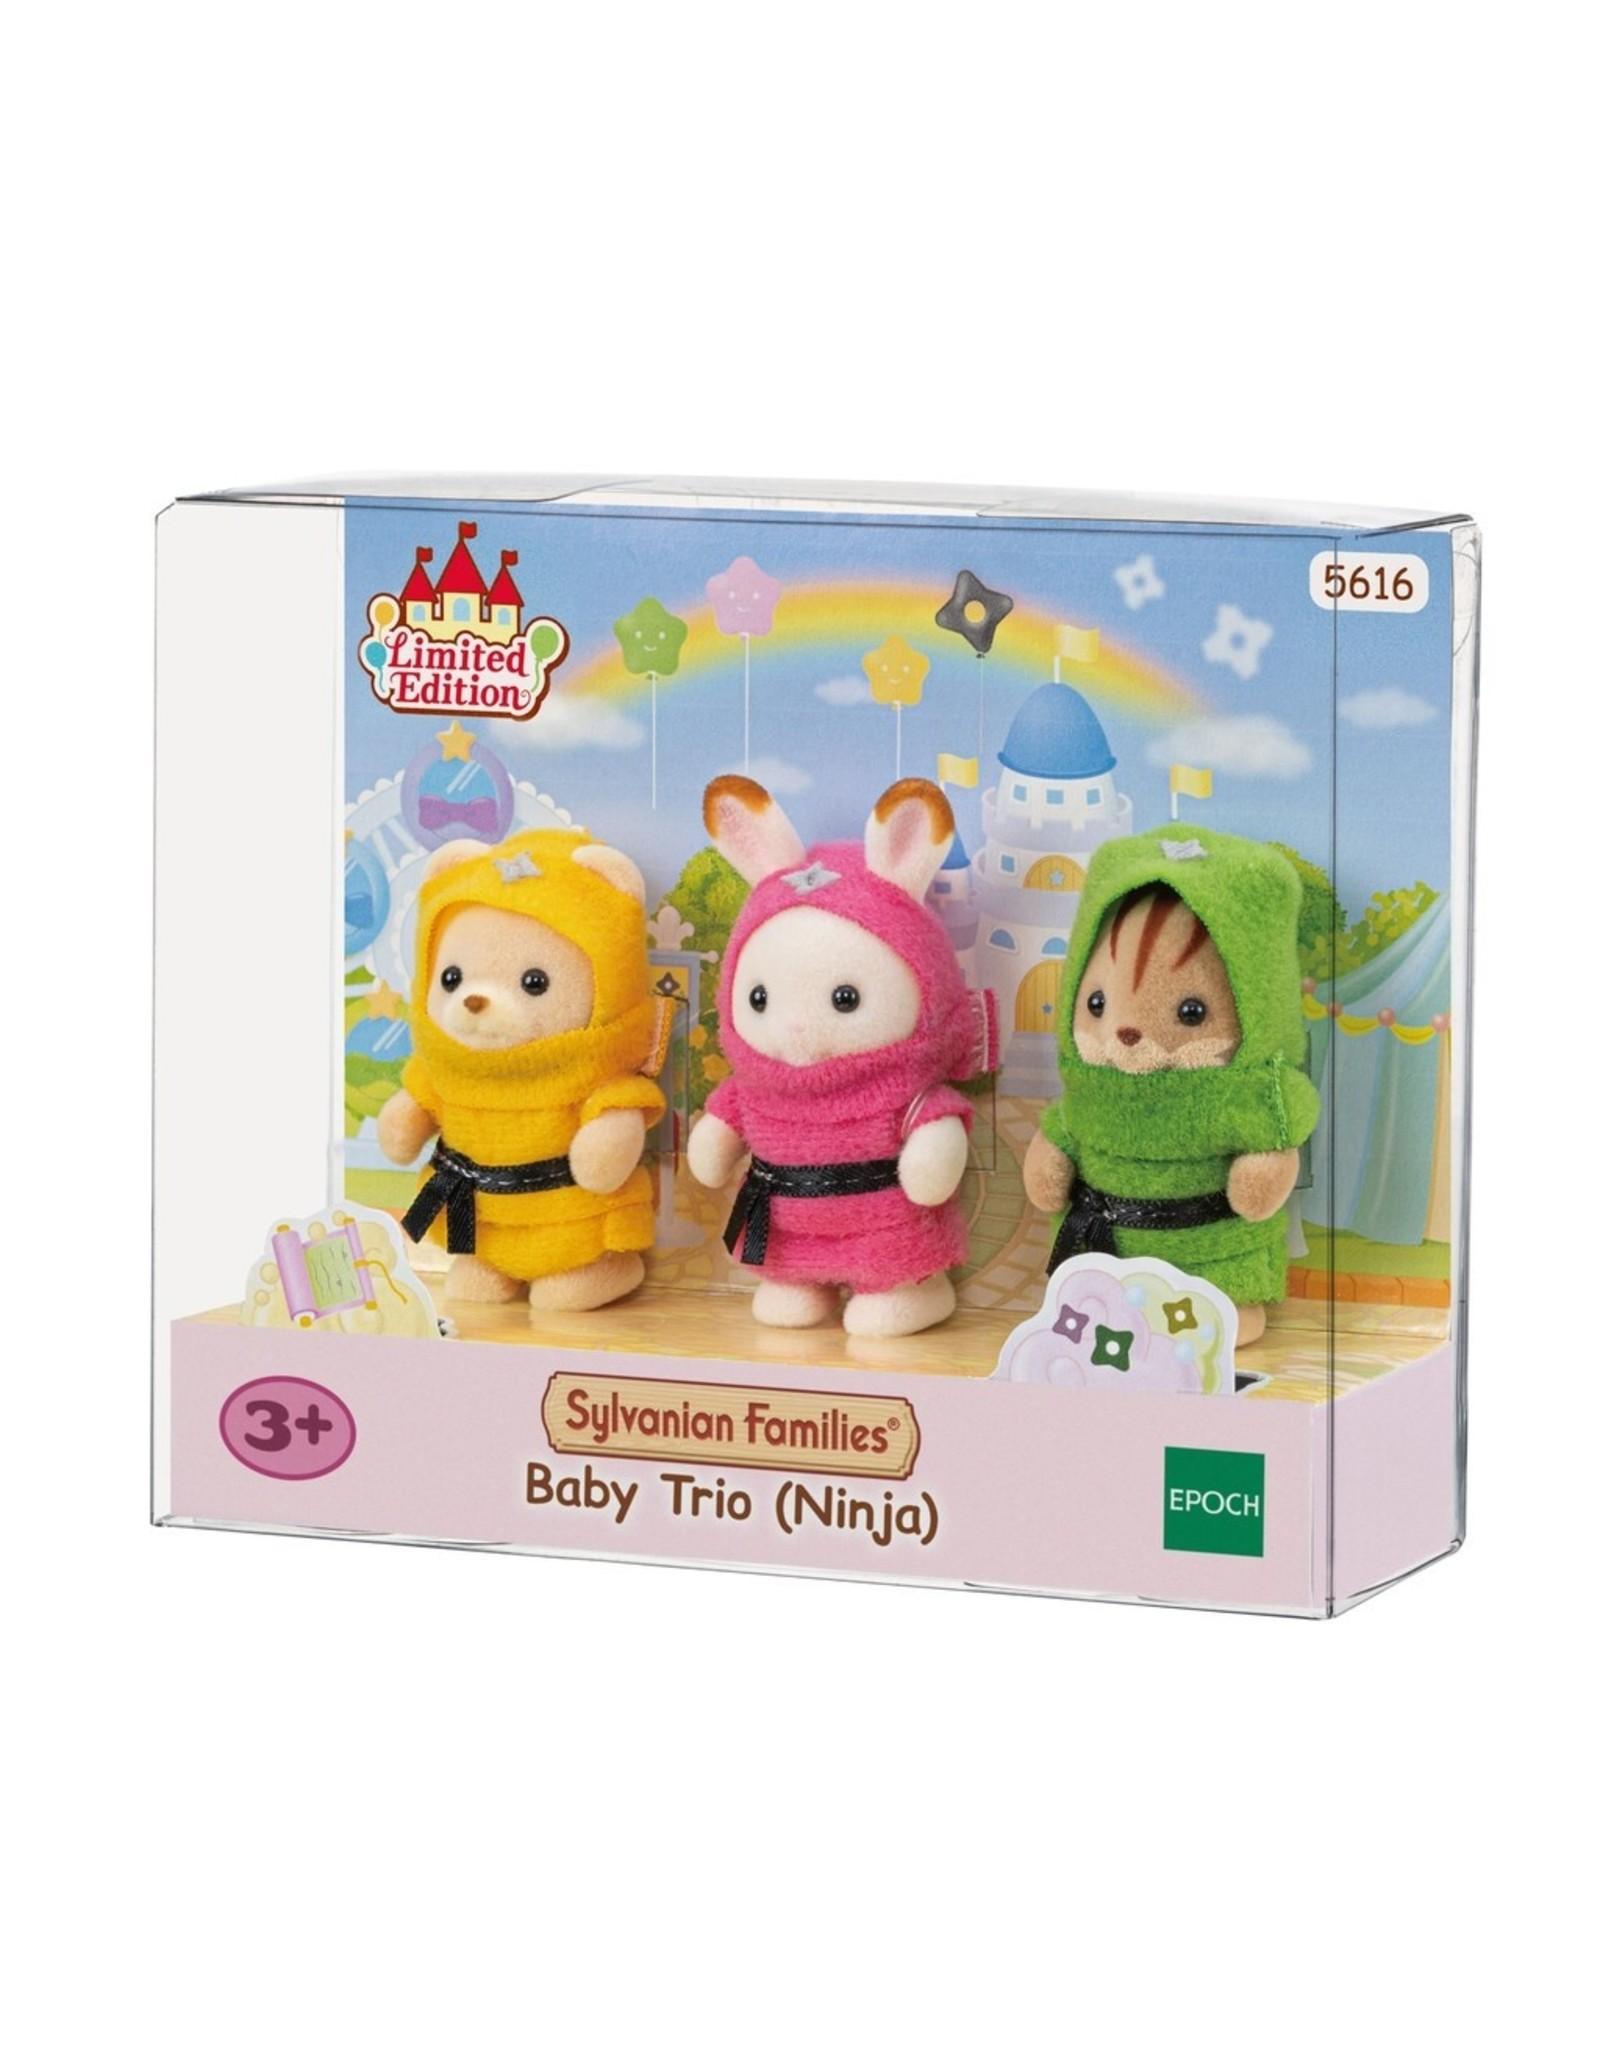 Sylvanian Families Baby Trio (Ninja)